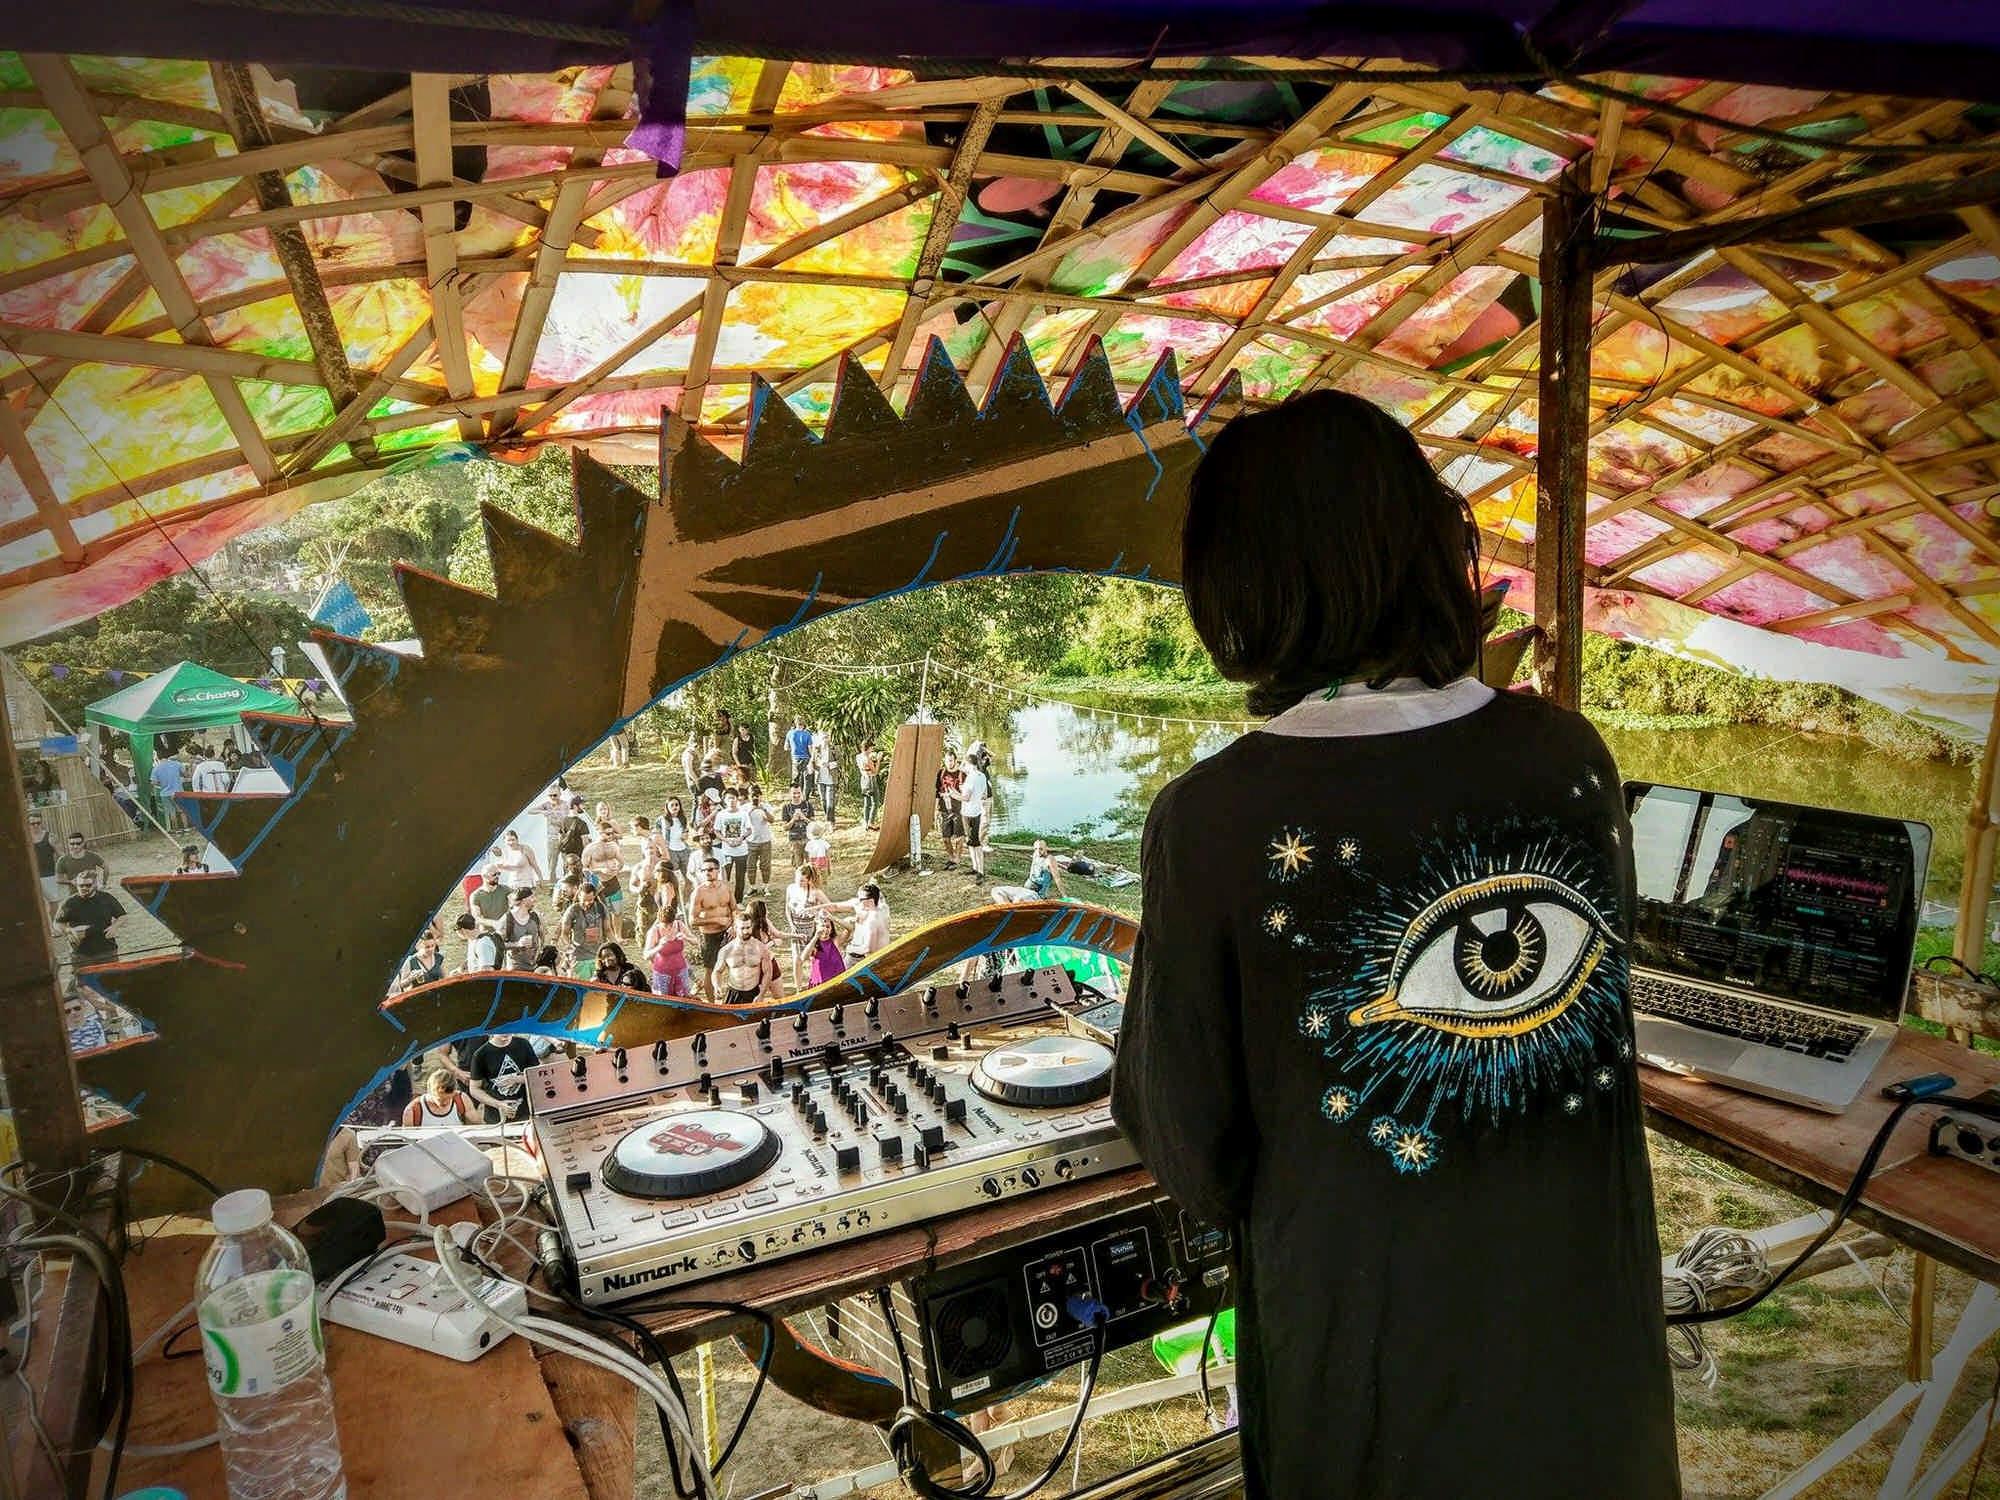 festival tomahawk 2018